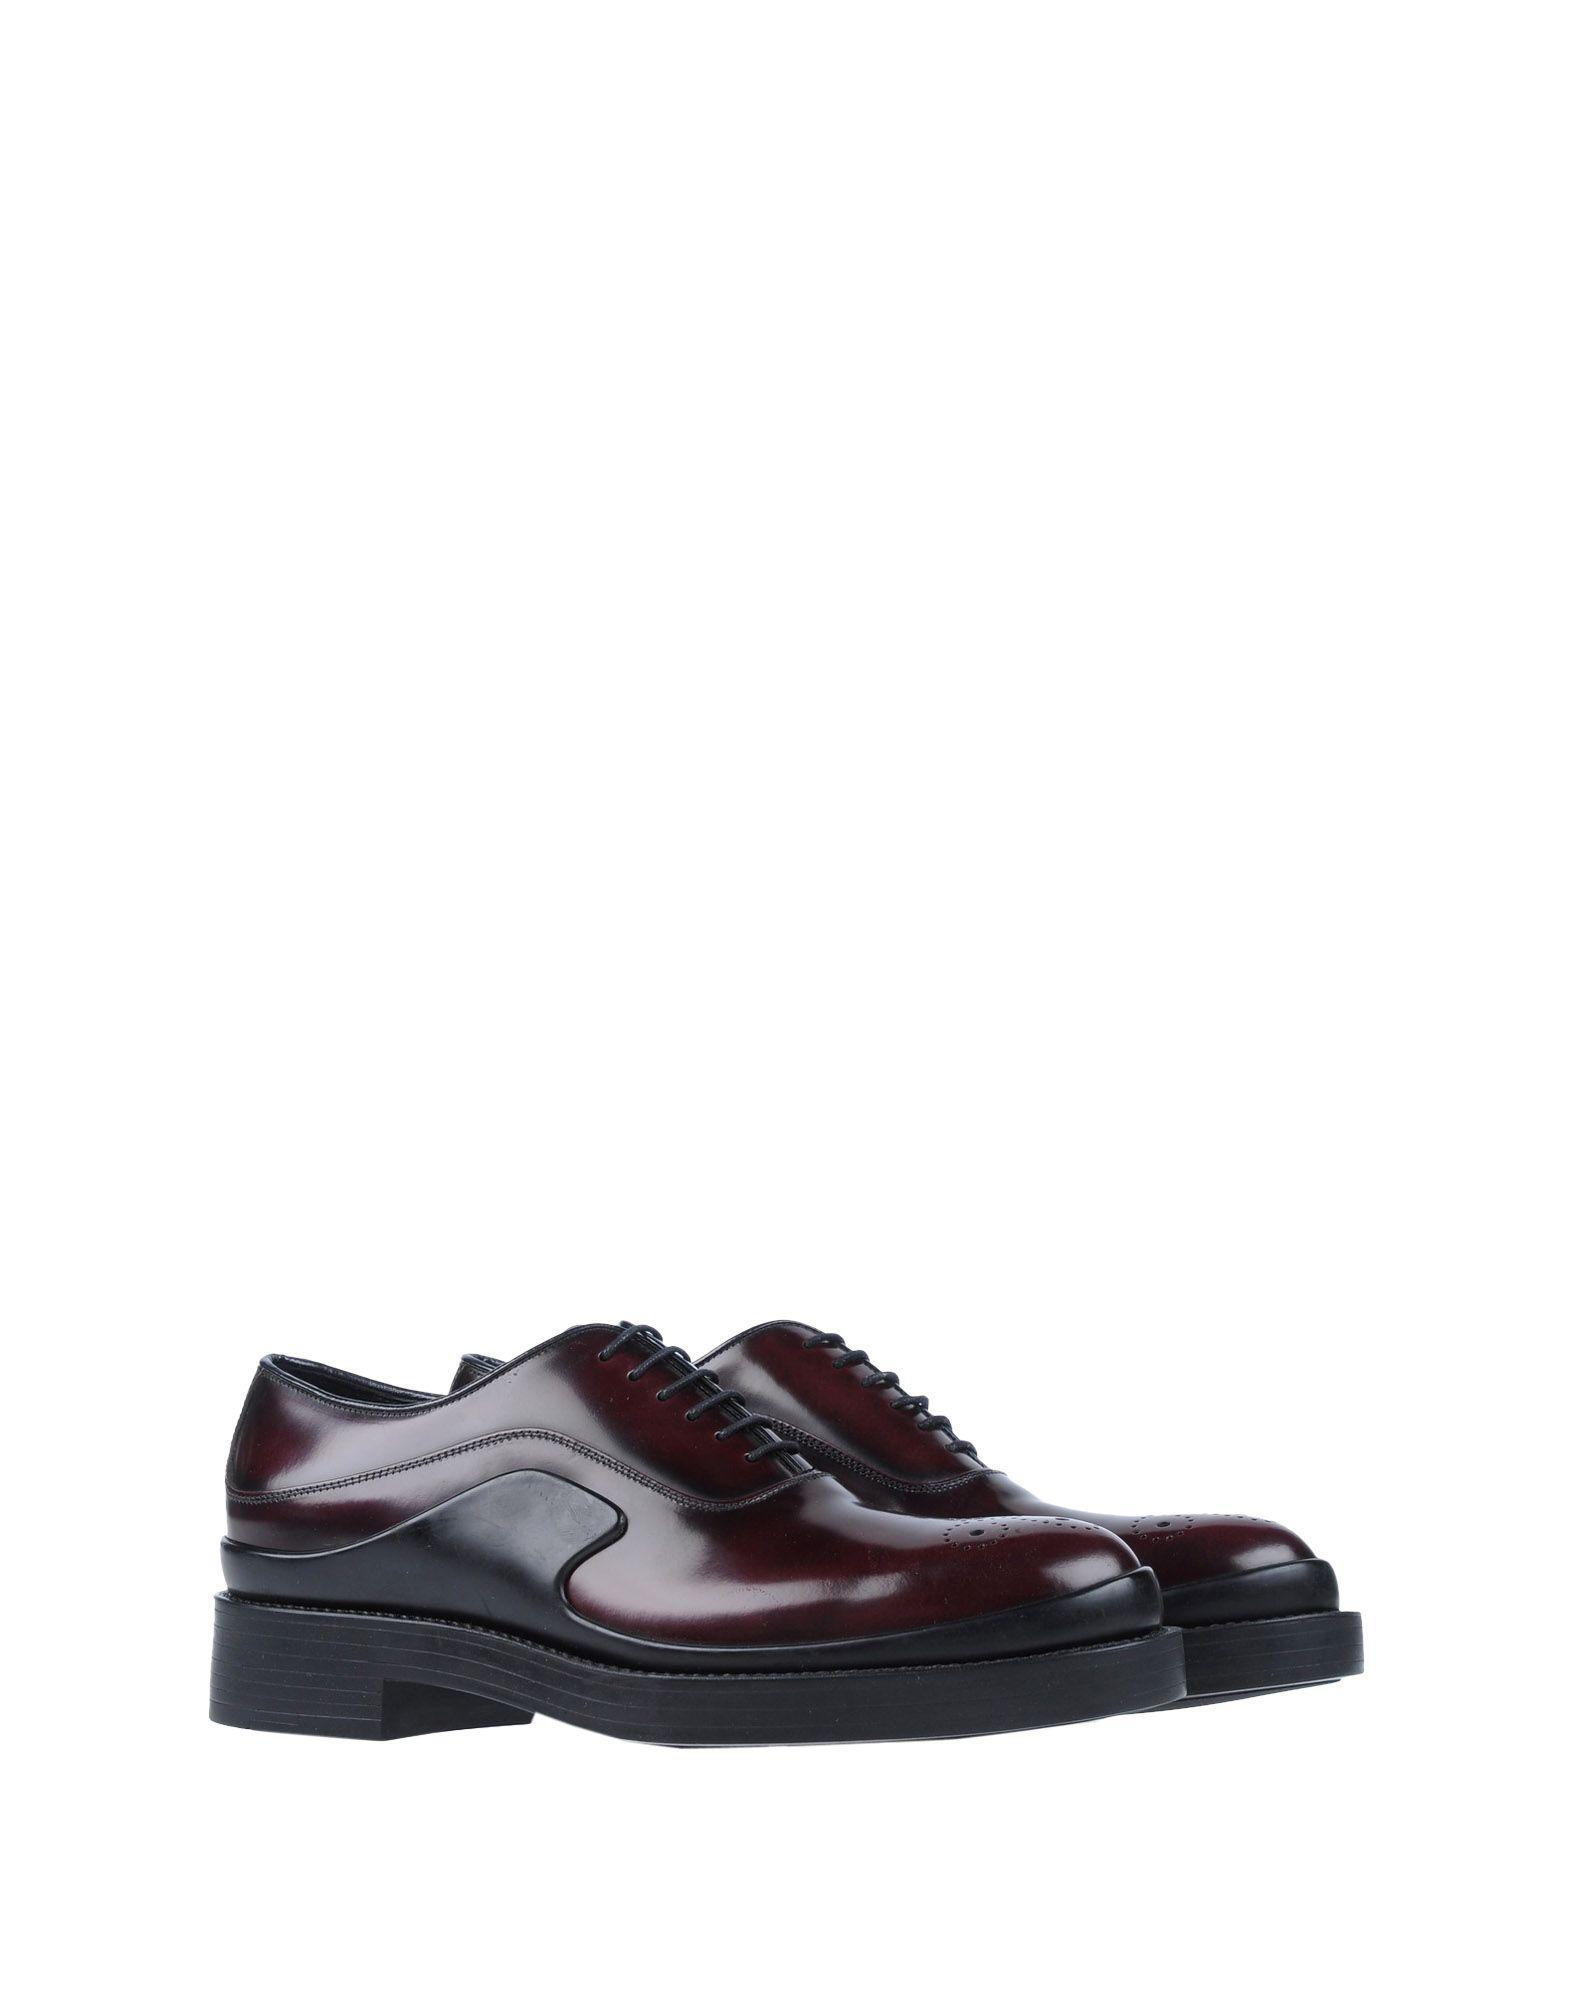 Prada Lace Up Leather Shoe With Lug Sole